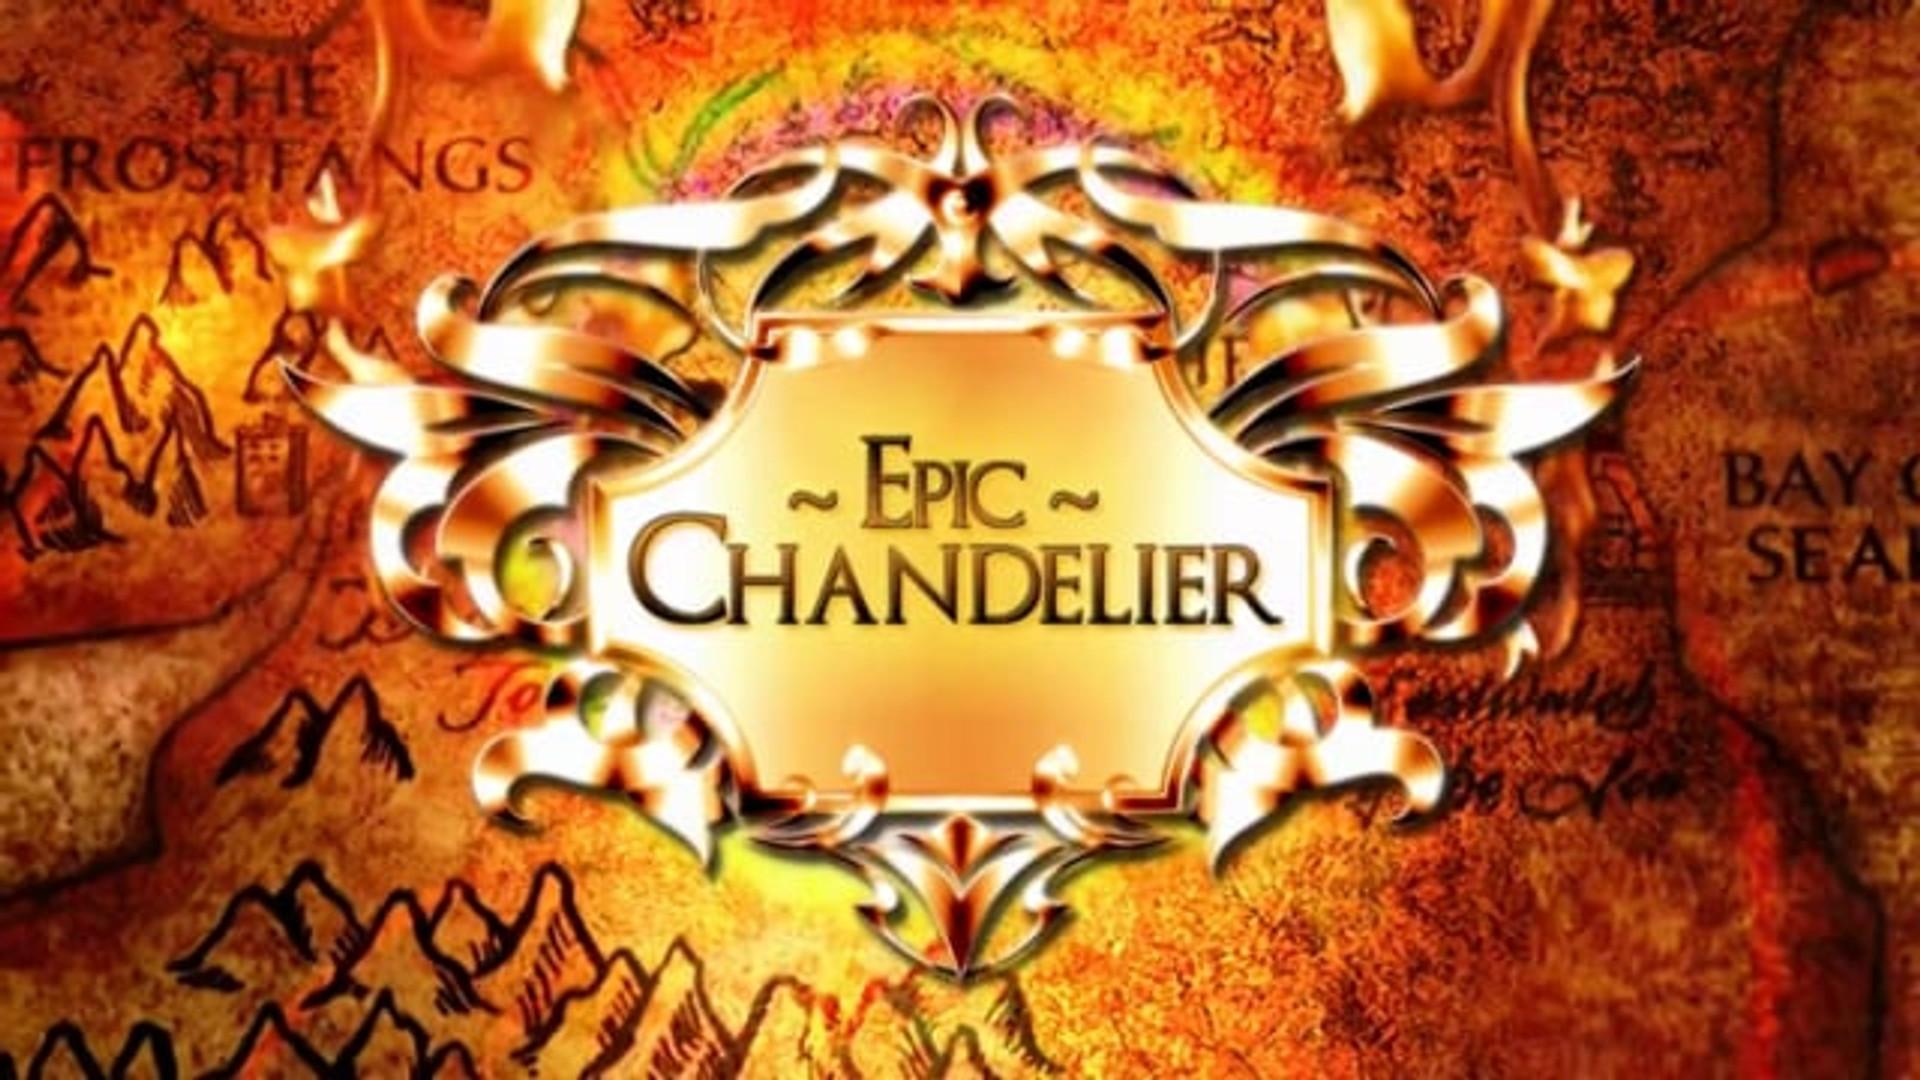 Epic Chandelier